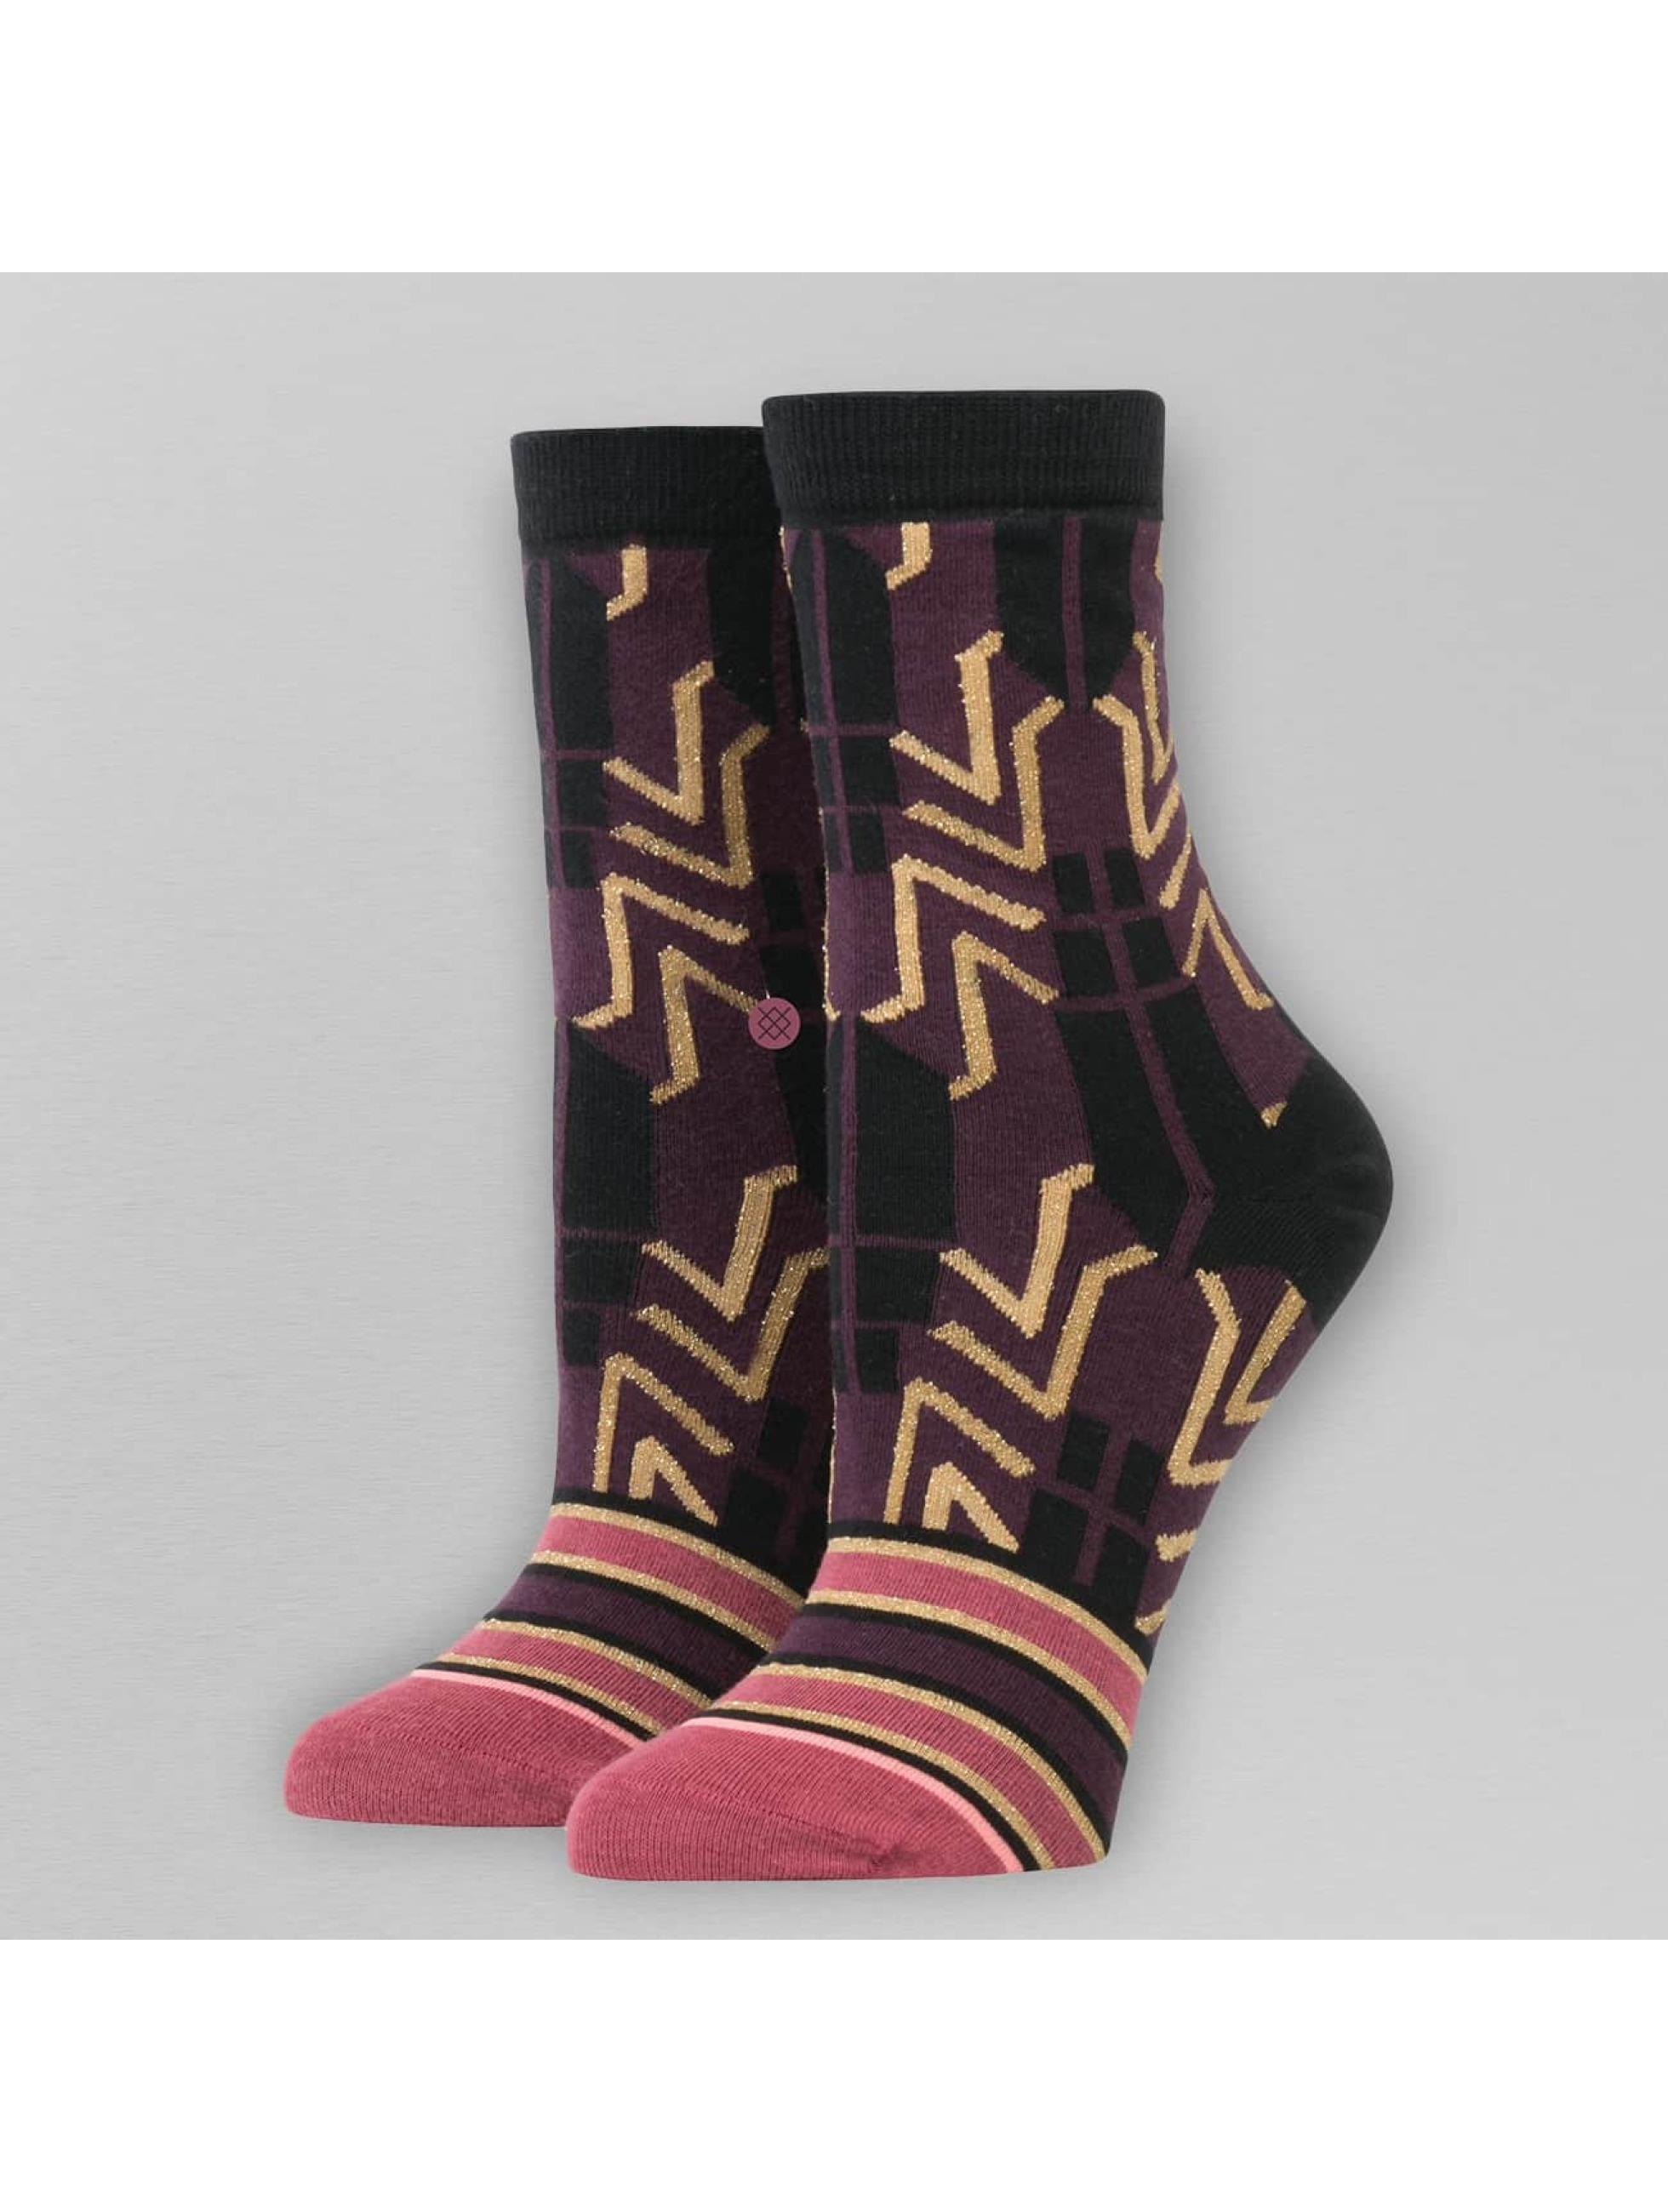 Stance Frauen Socken Nile in bunt